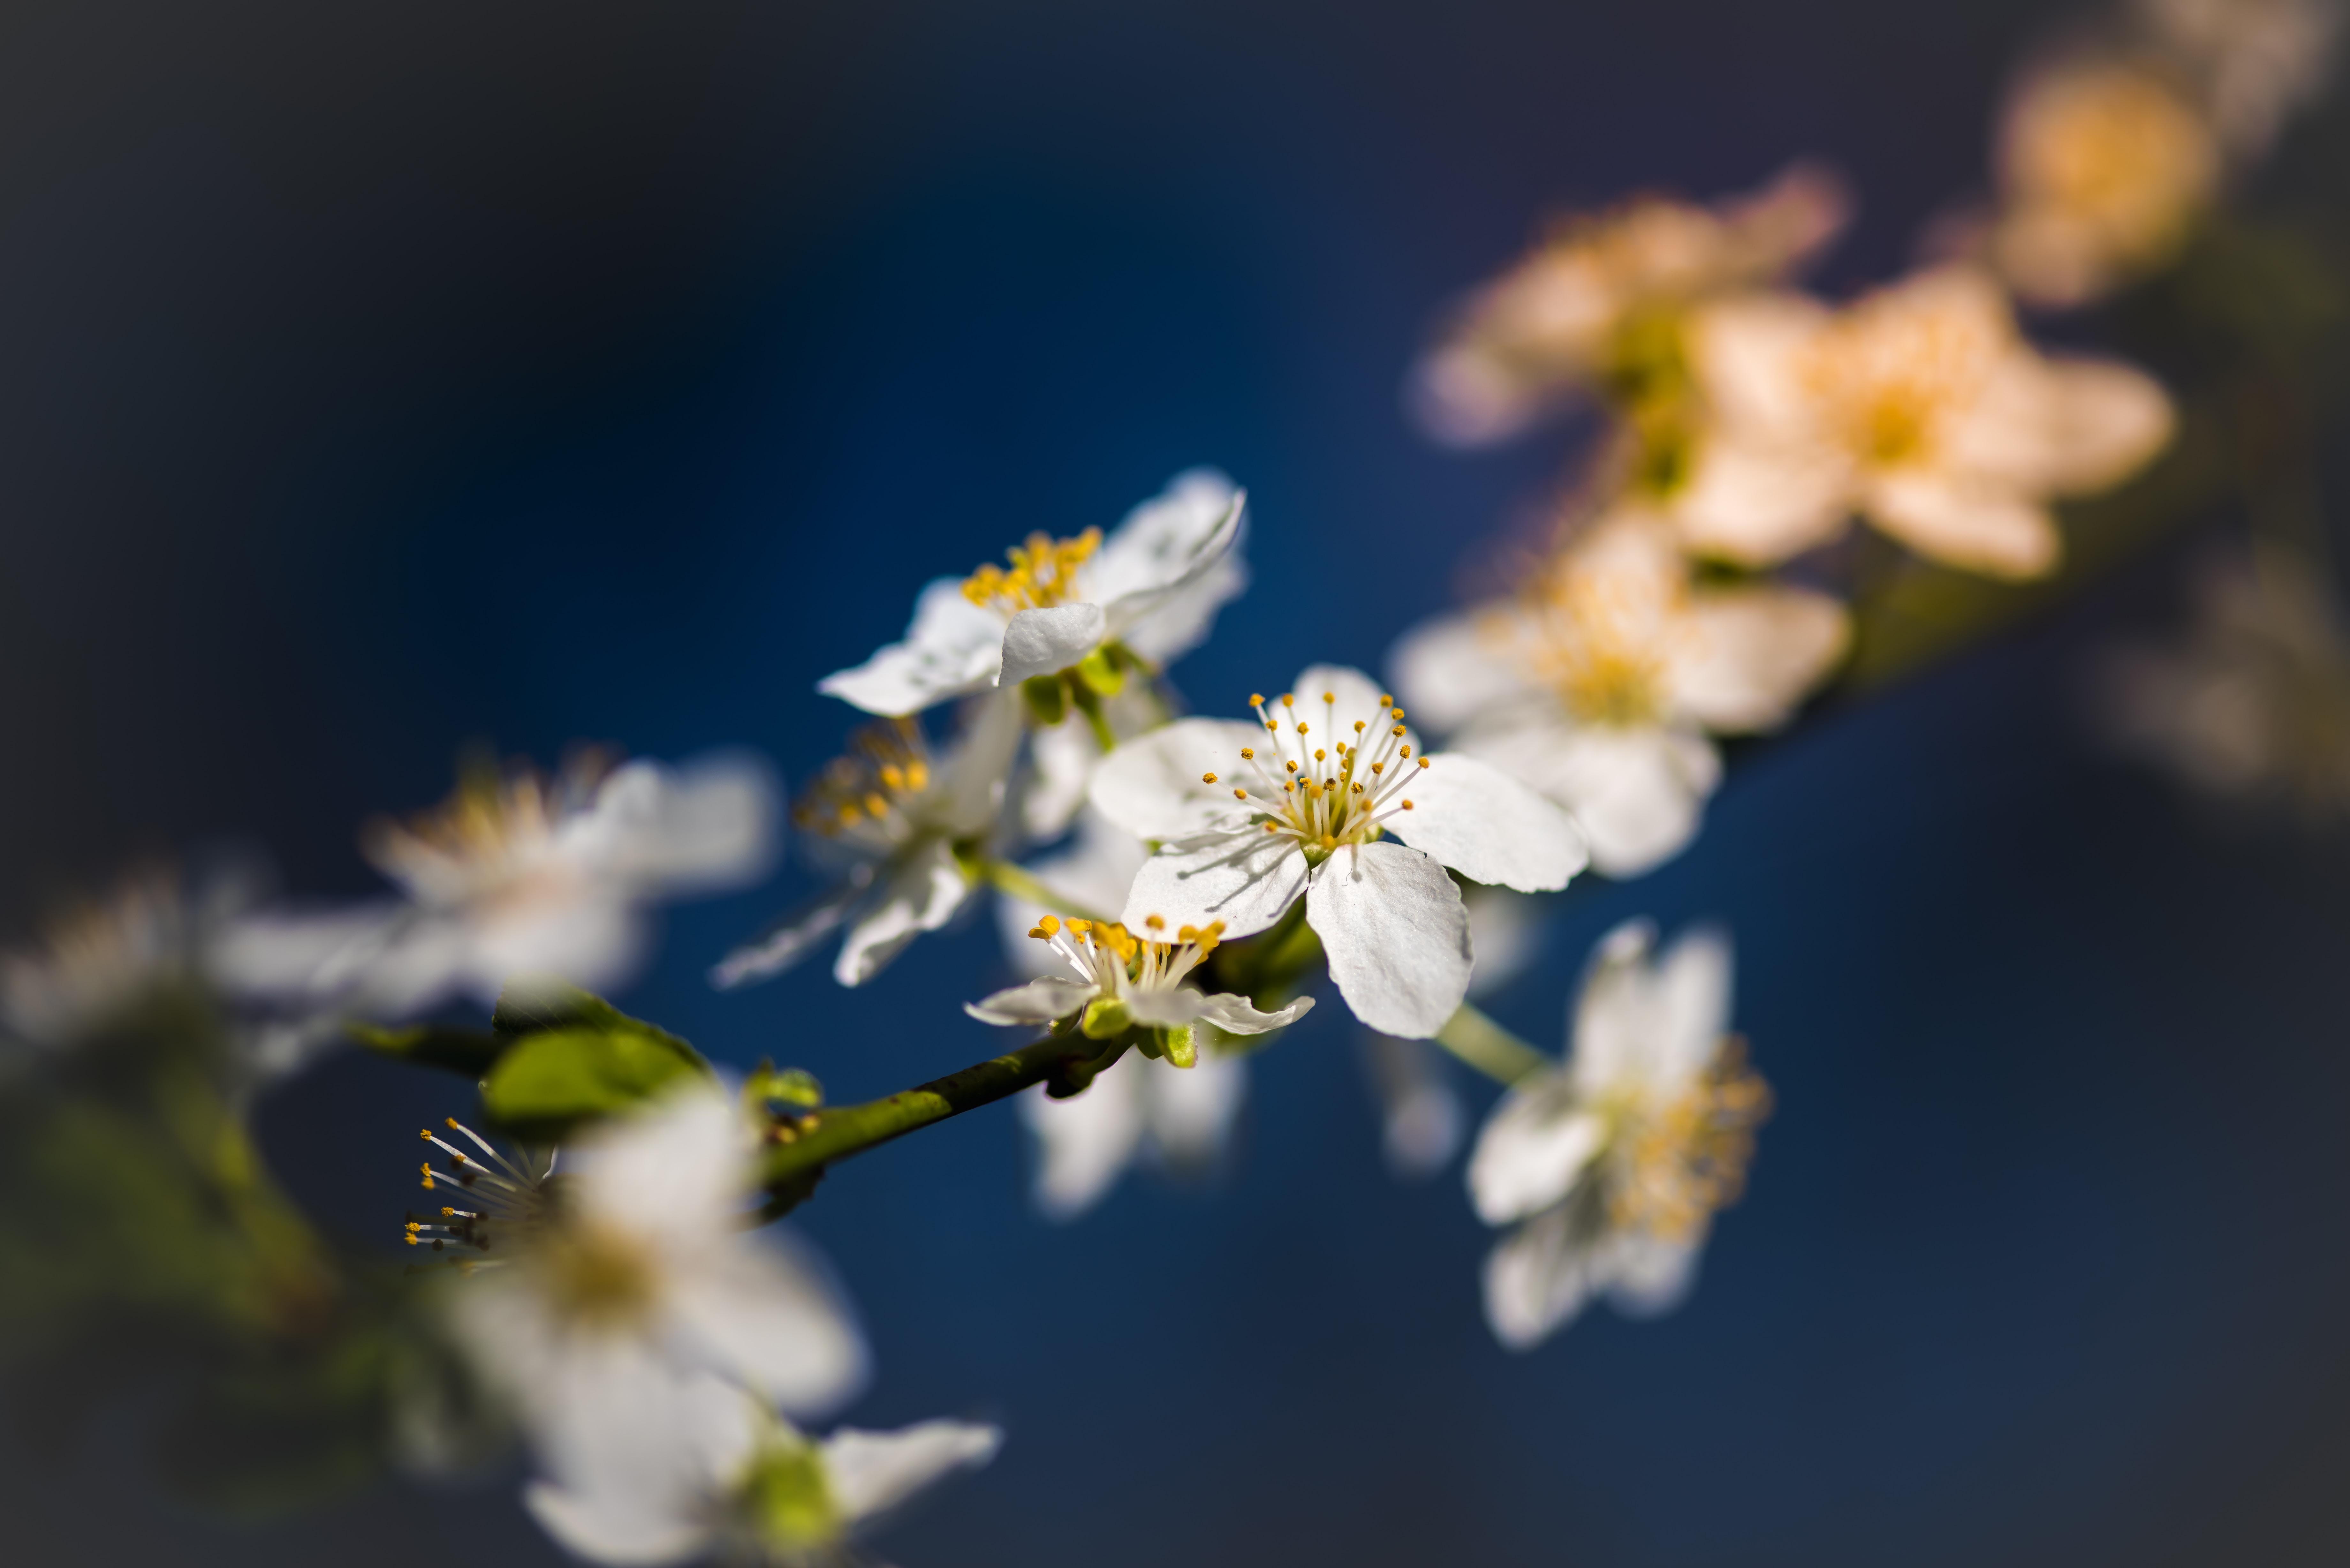 White blossom flowers on branch with dark blue background in Spring, Parcul Cismigiu